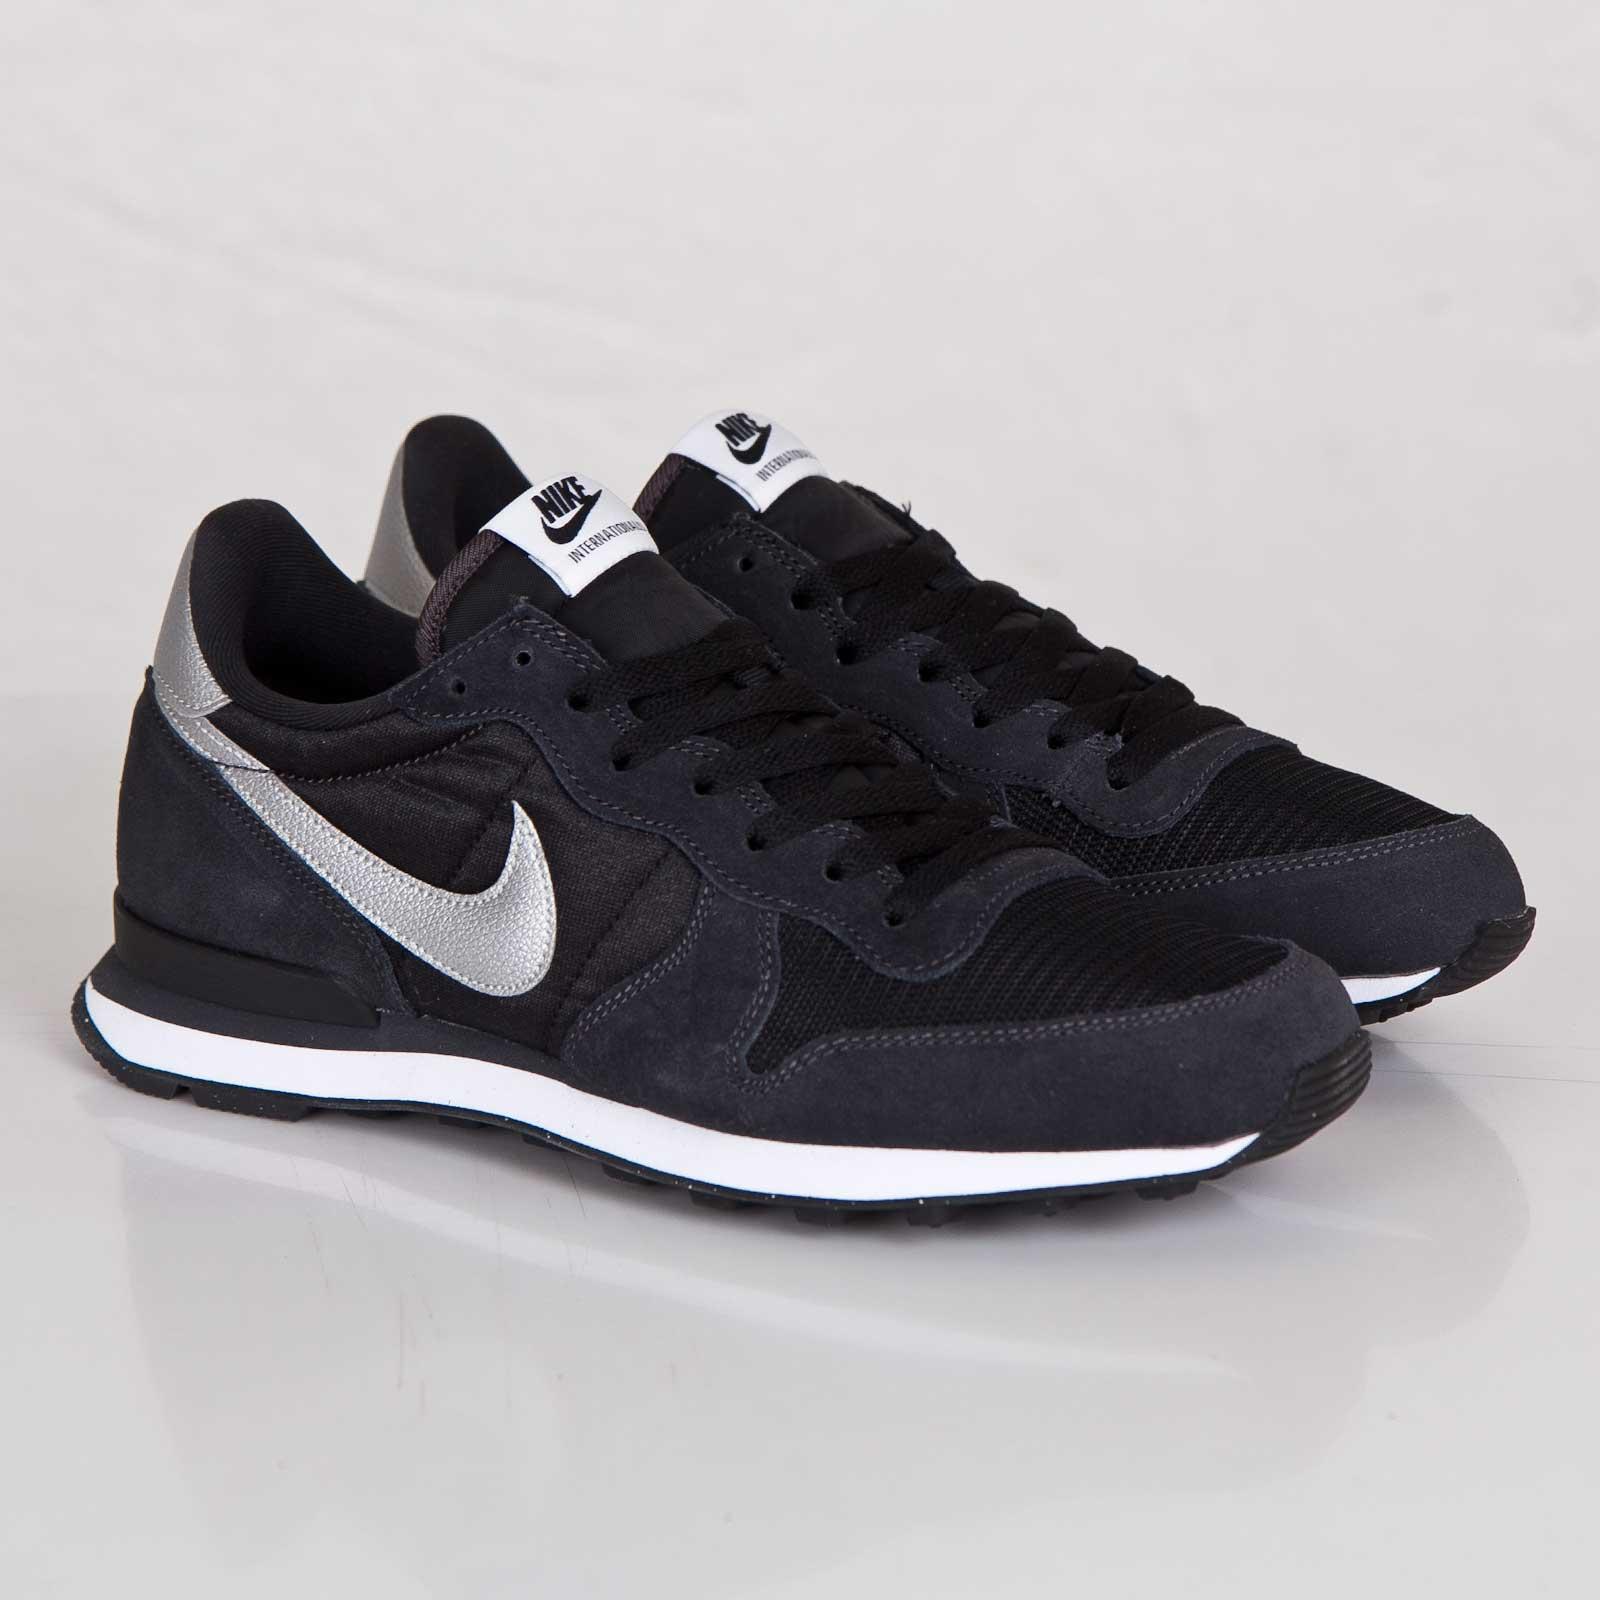 Nike Internationalist 631754 003 Sneakersnstuff